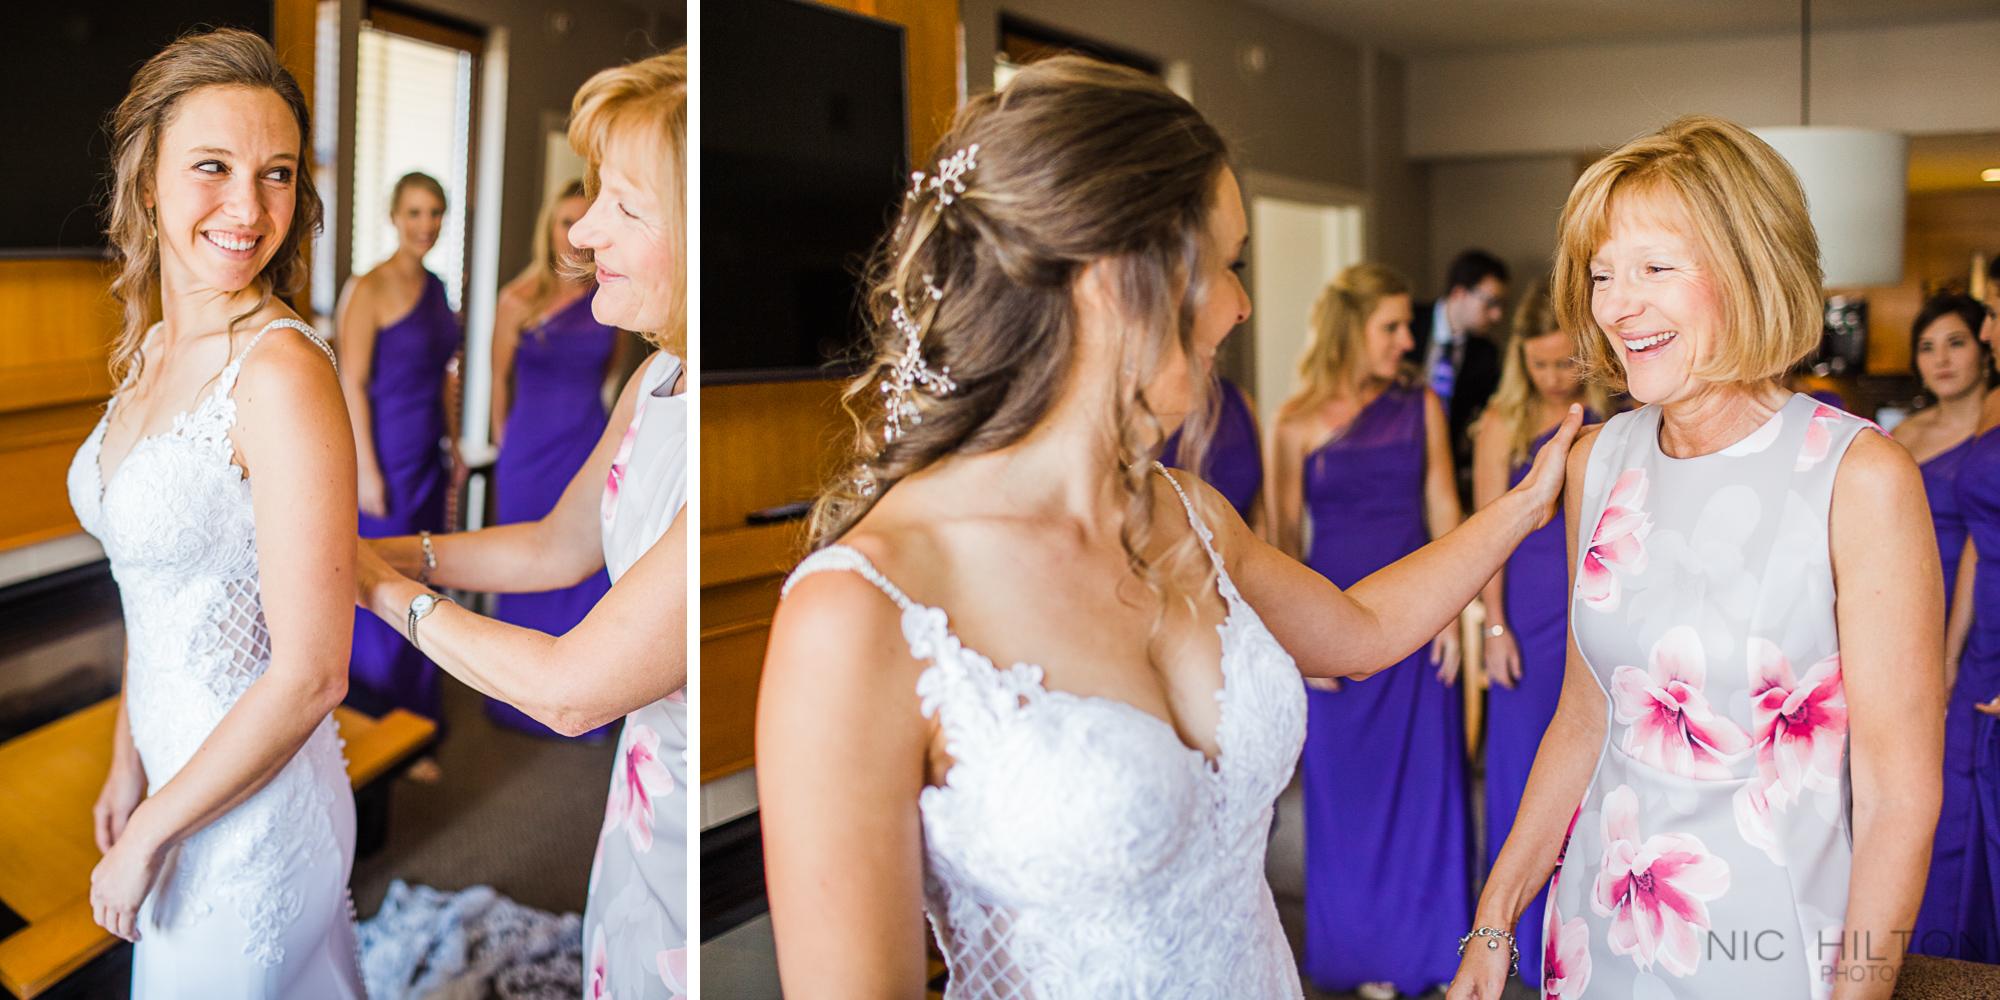 Bride-dress-June-lake-wedding-photography.jpg